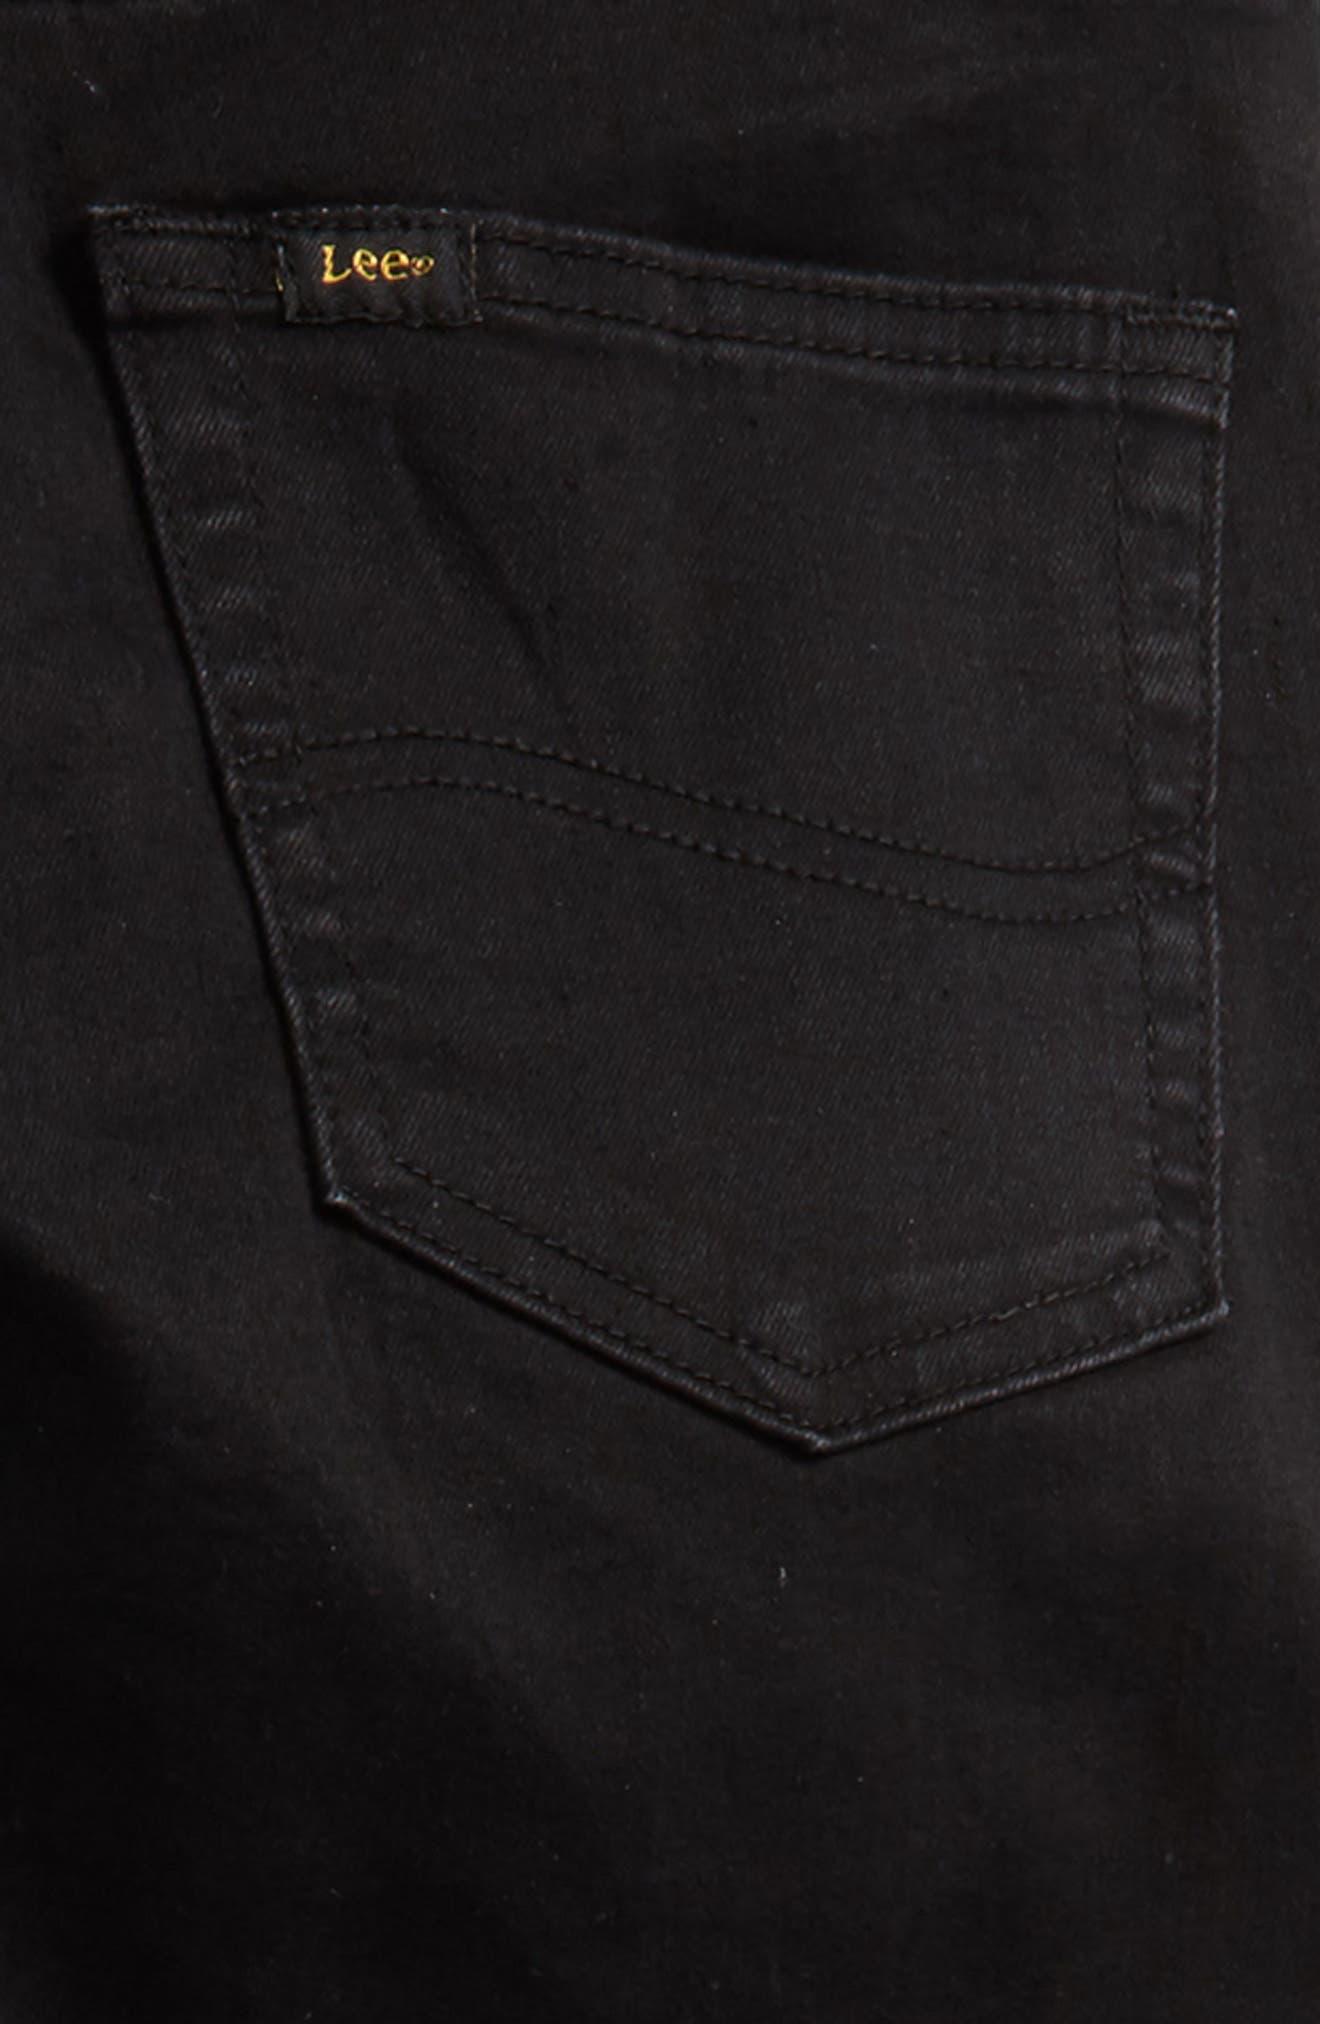 Stretch Skinny Jeans,                             Alternate thumbnail 3, color,                             Jet